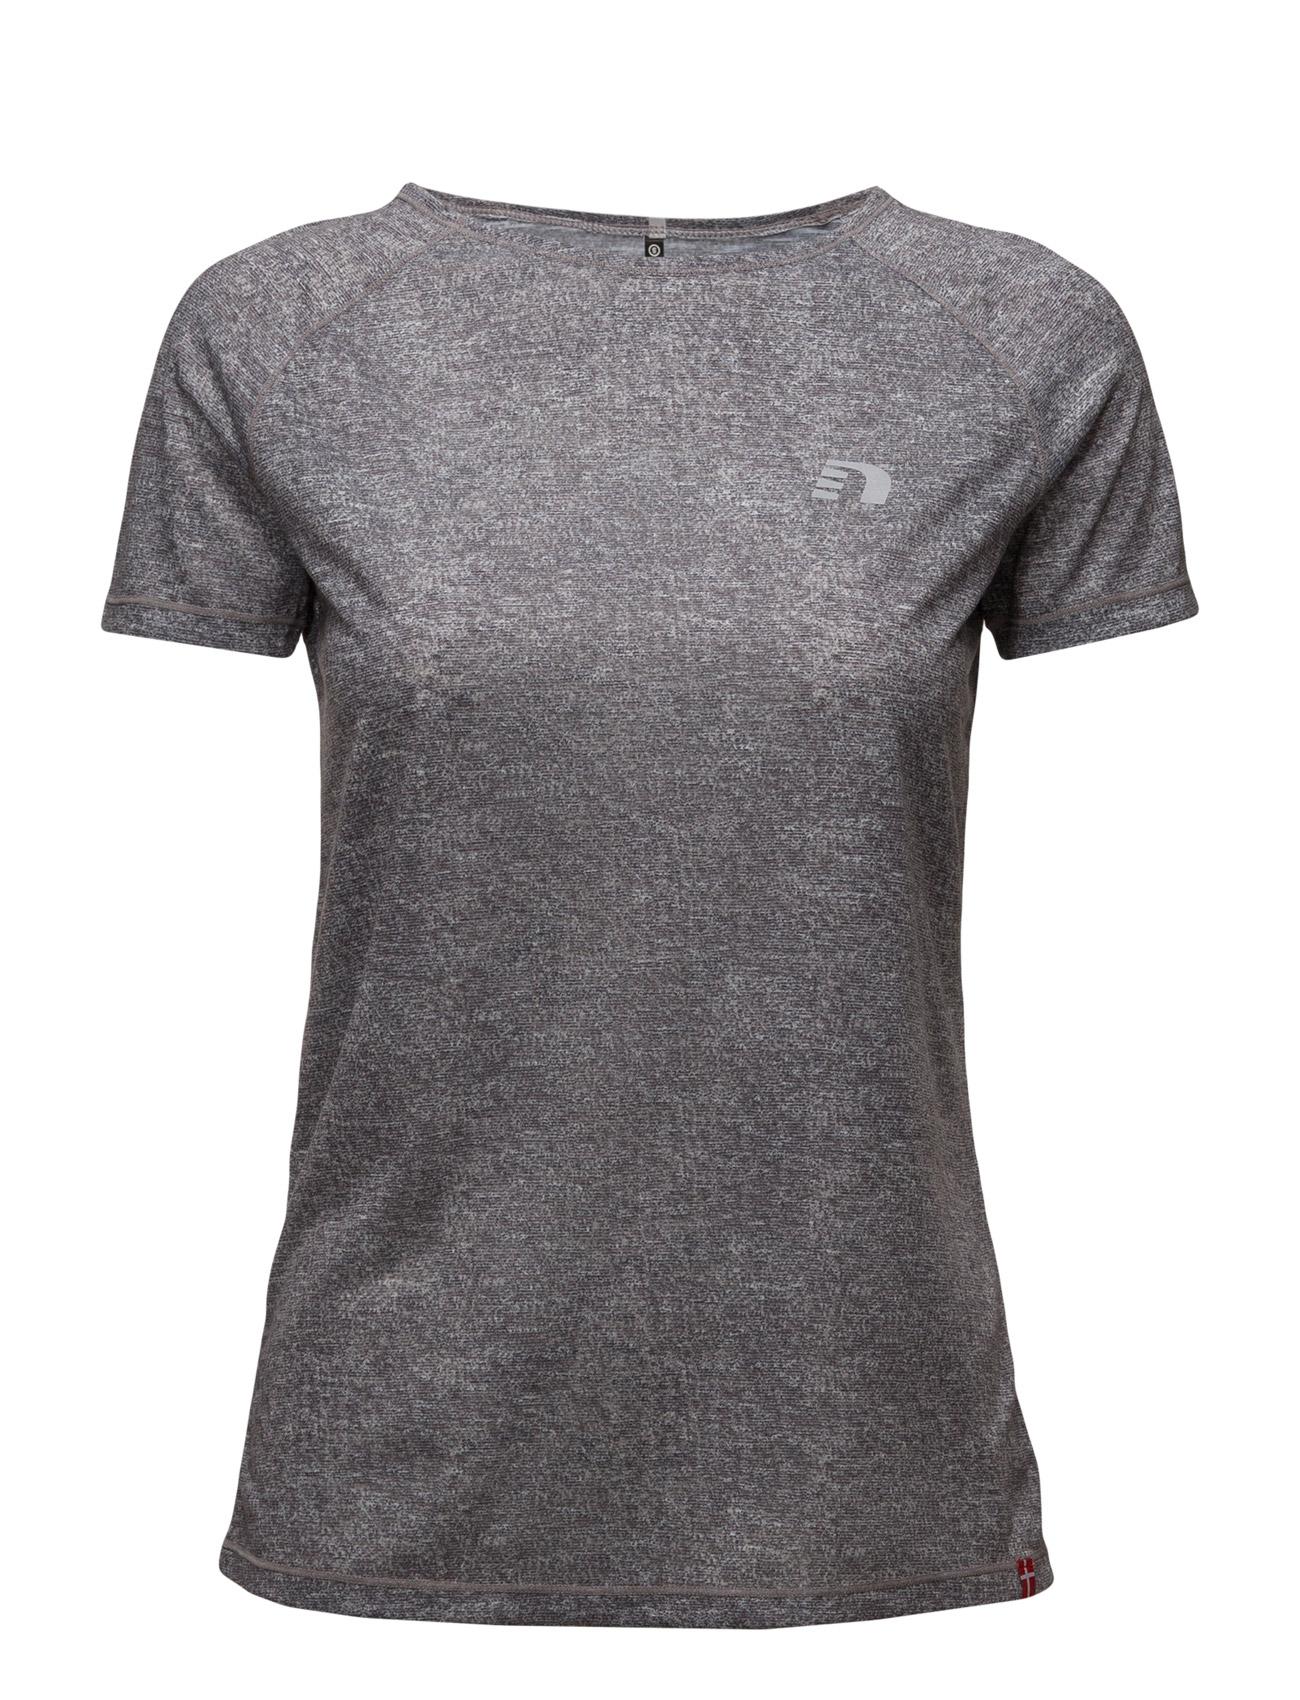 Imotion Heather Tee Newline Løbe t-shirts til Damer i Asfalt